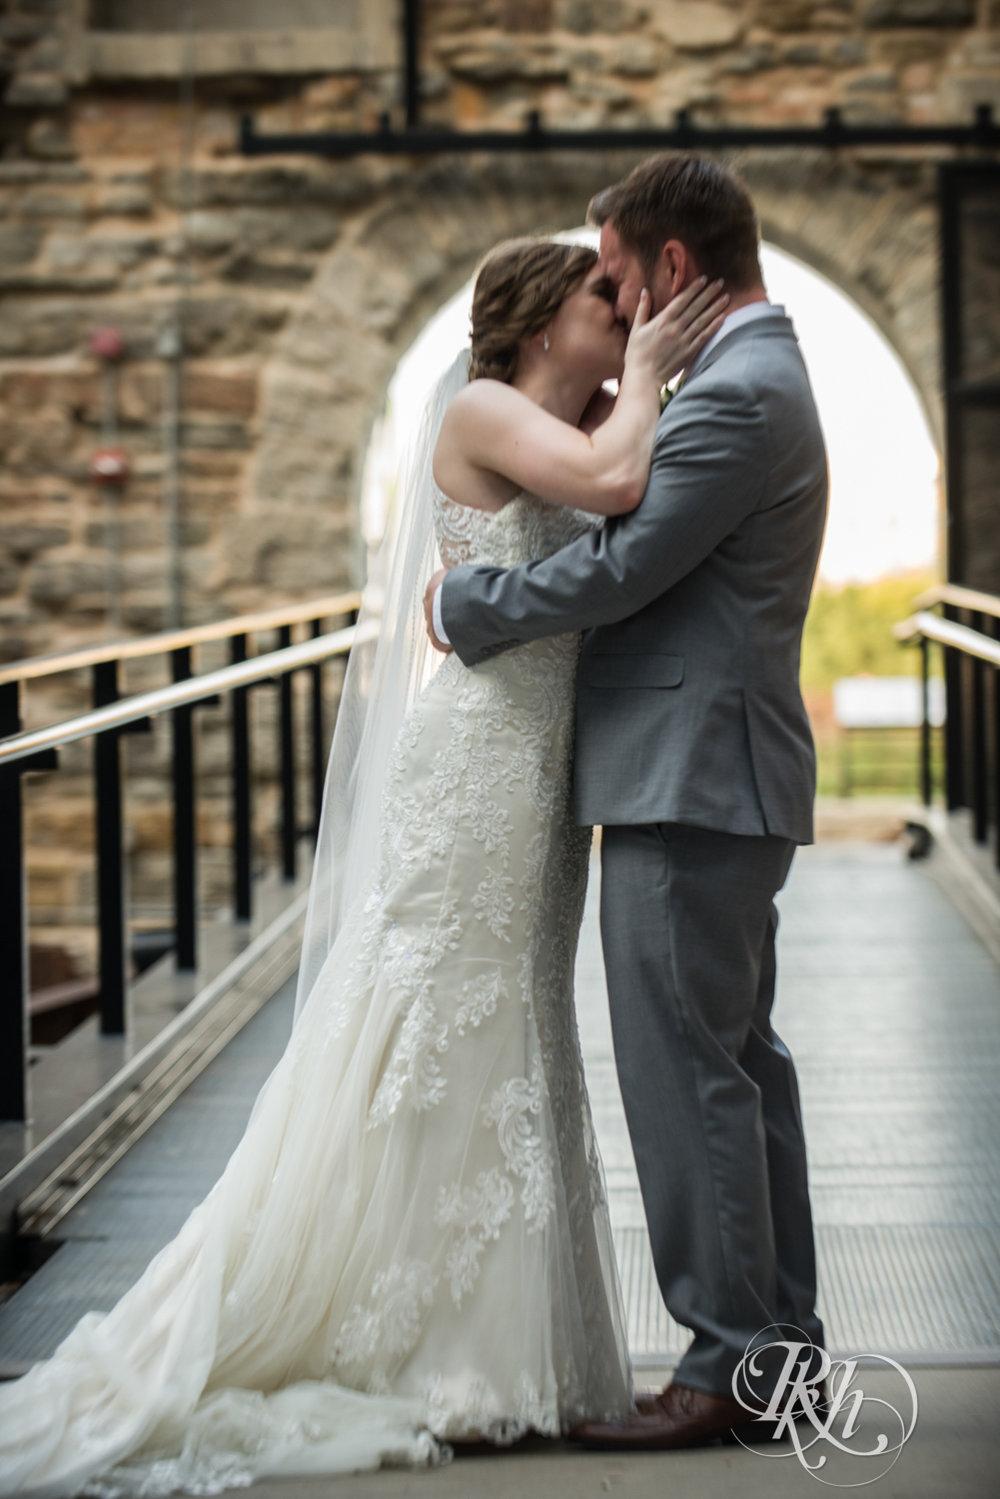 Lauren & Matt - Minnesota Wedding Photography - Mill City Museum - RKH Images - Blog (30 of 55).jpg